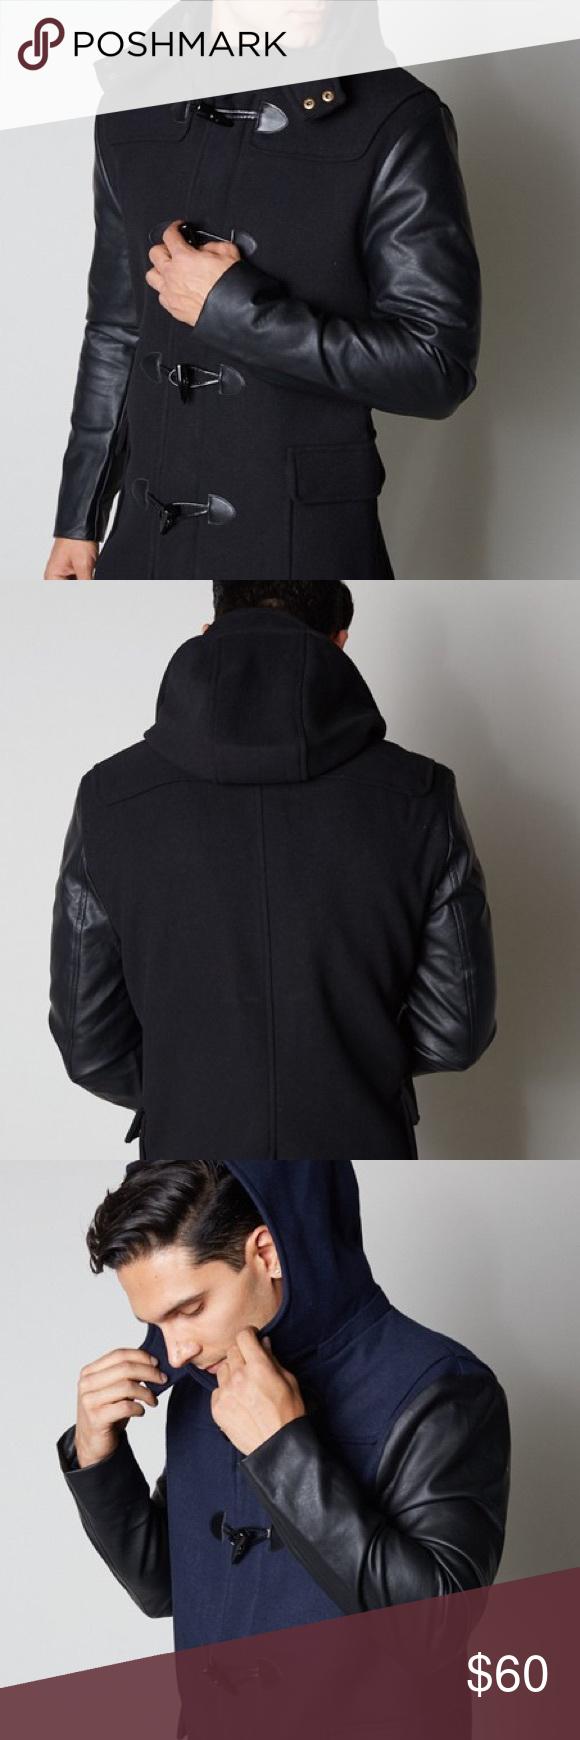 Premium Leather Sleeve Jacket Long Coat Pea Coat Mens